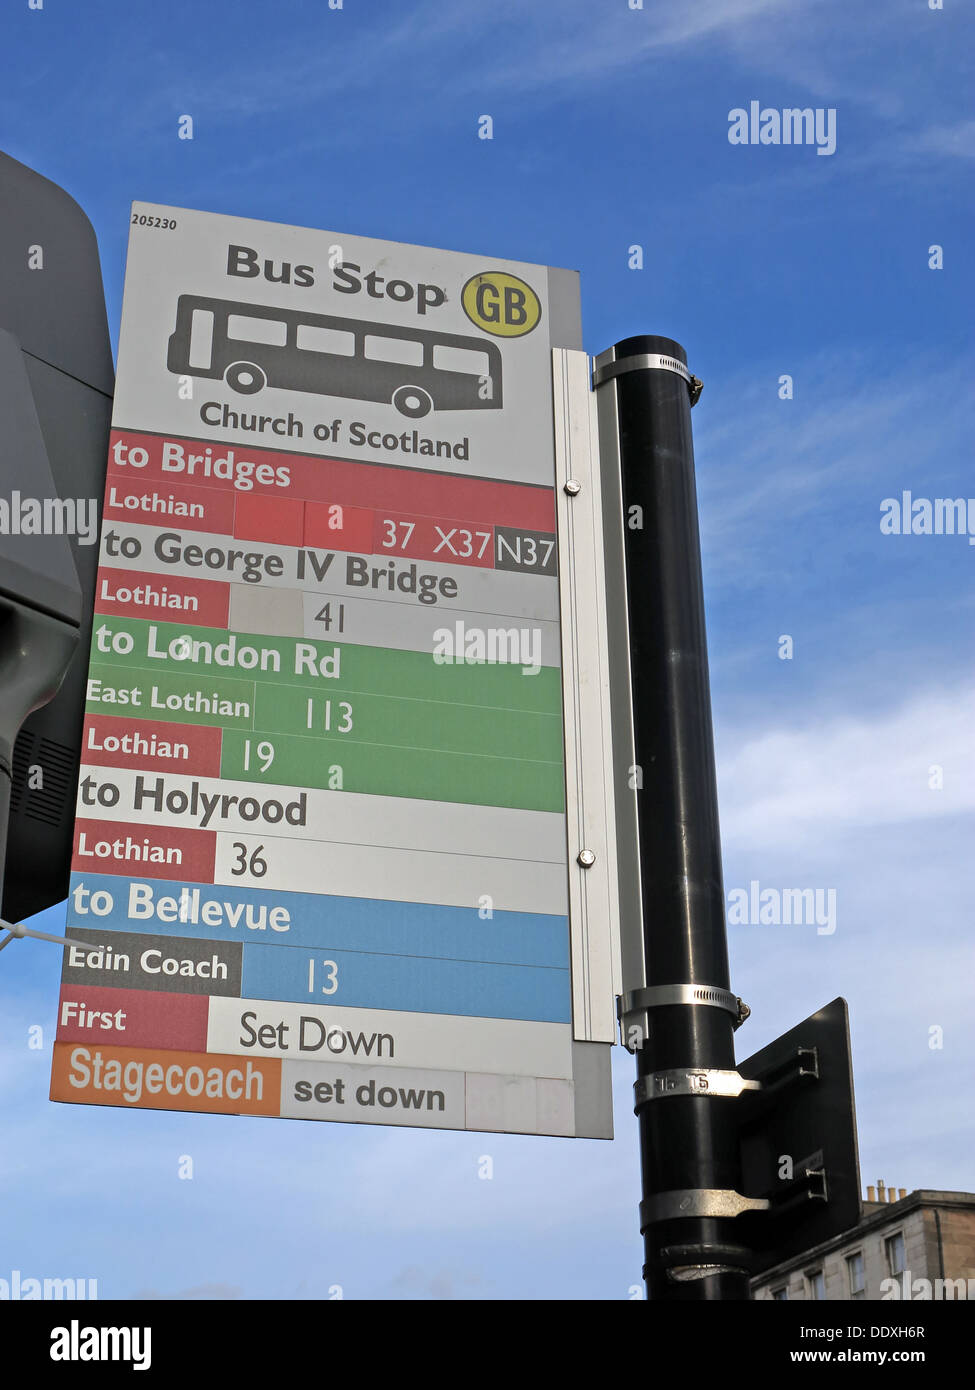 Edinburgh city bus stop,Lothian,First,Stagecoach buses - Stock Image